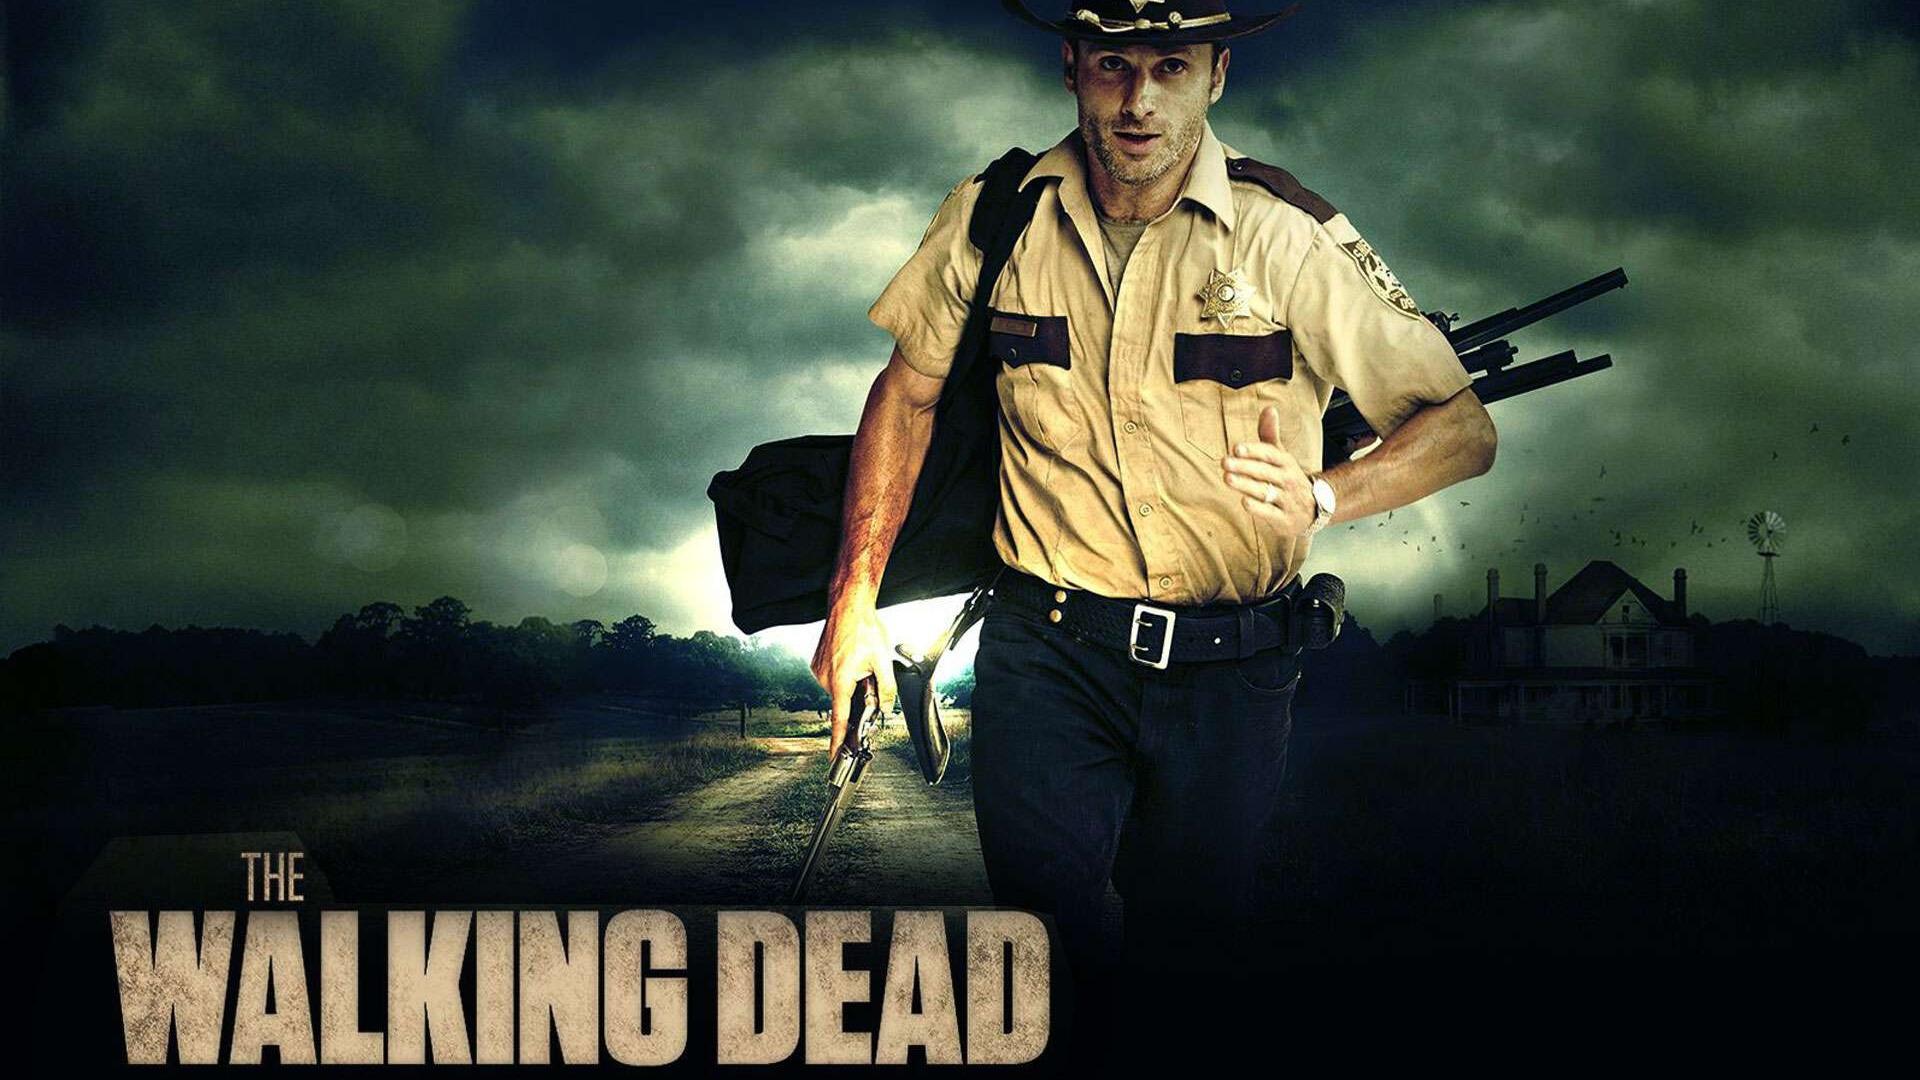 The Walking Dead free photo